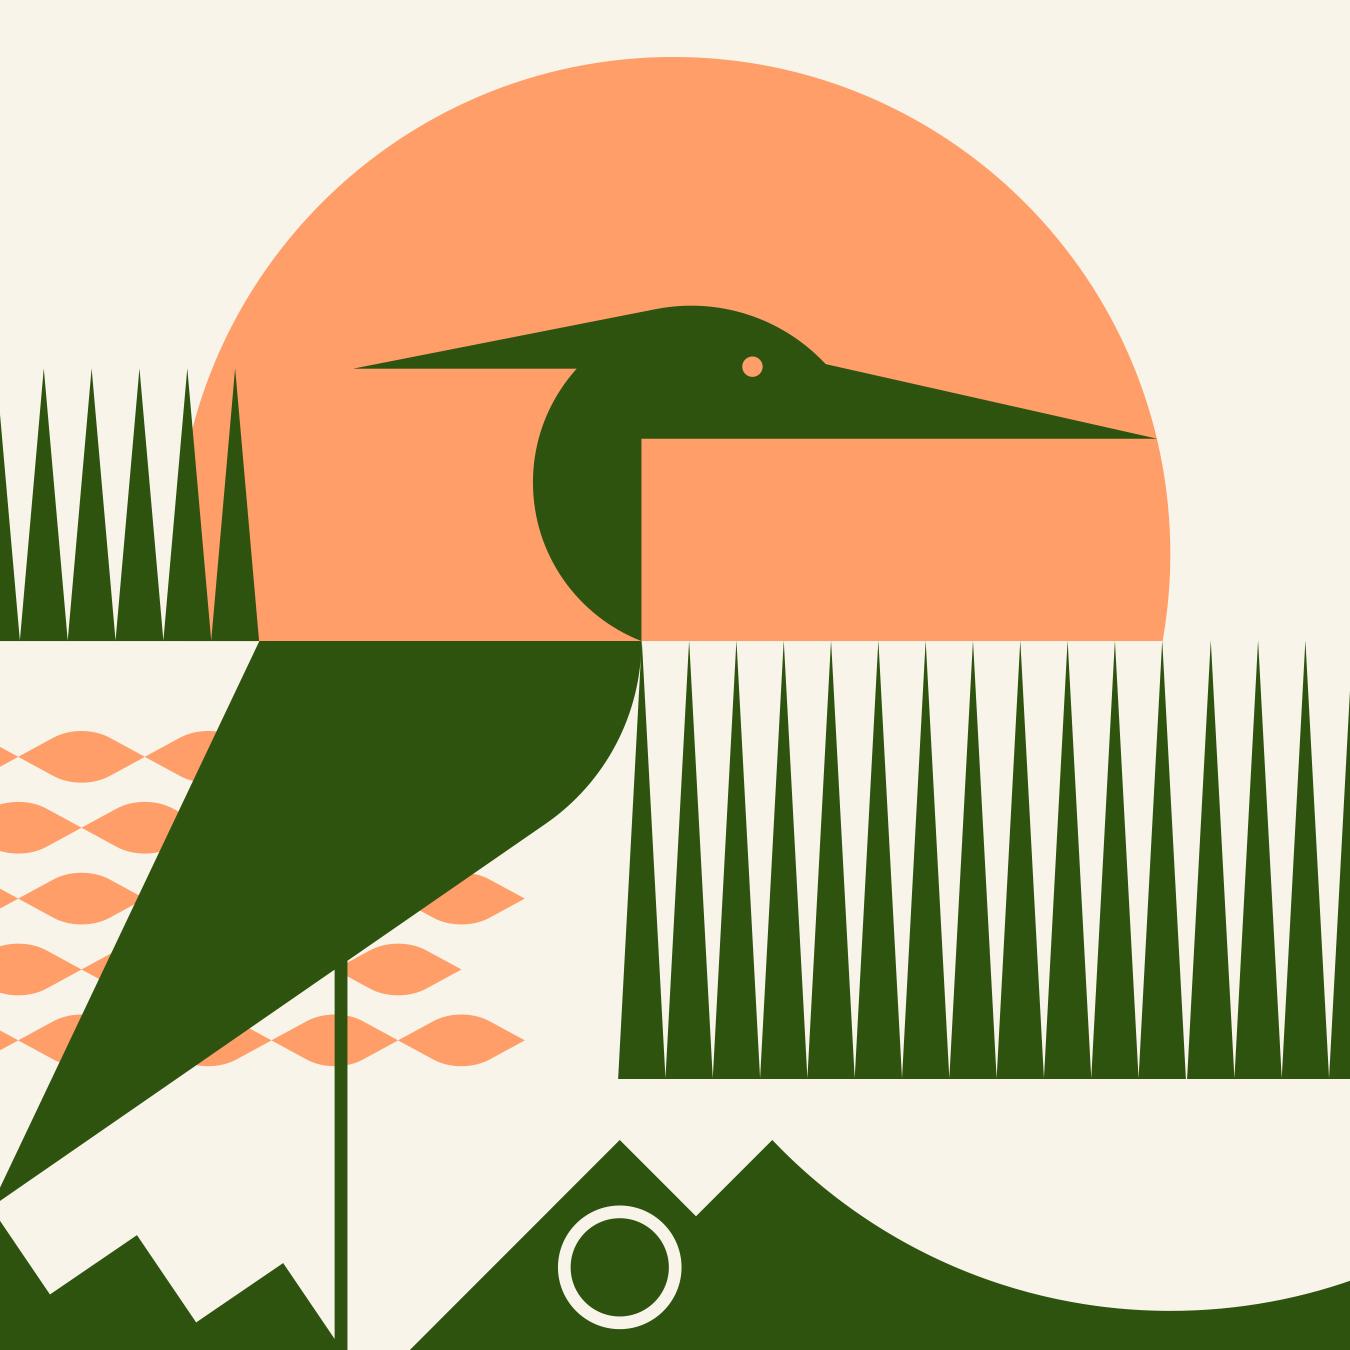 239 Flies Heron and Alligator Illustration